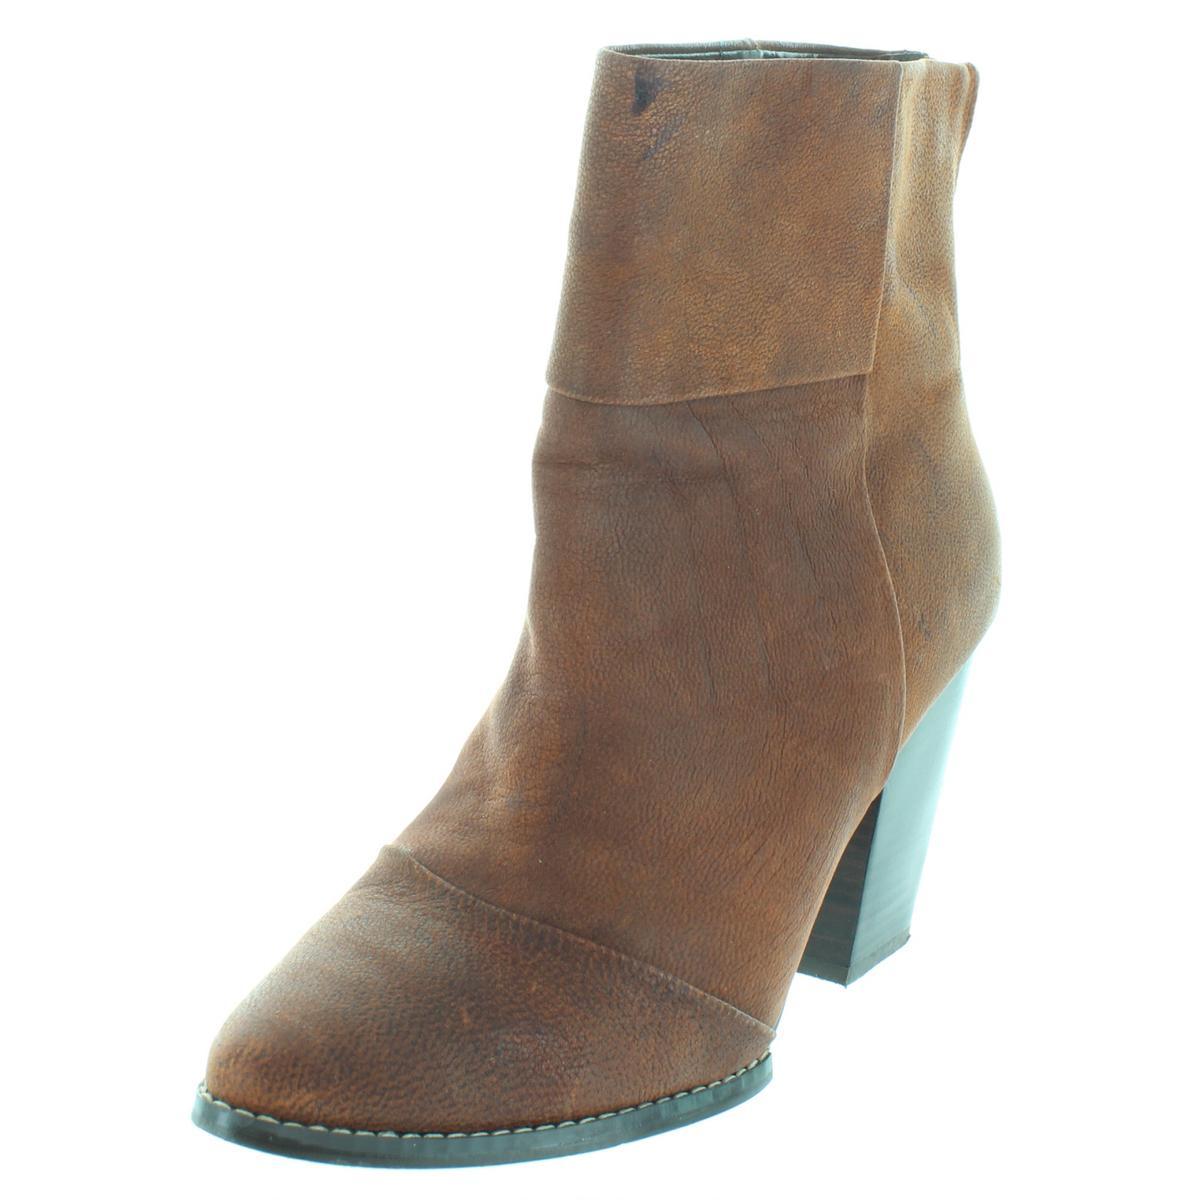 Kelsi Dagger damen Tan Leather Stiefelies schuhe 8.5 8.5 8.5 Medium (B,M) BHFO 0345 1ad96d